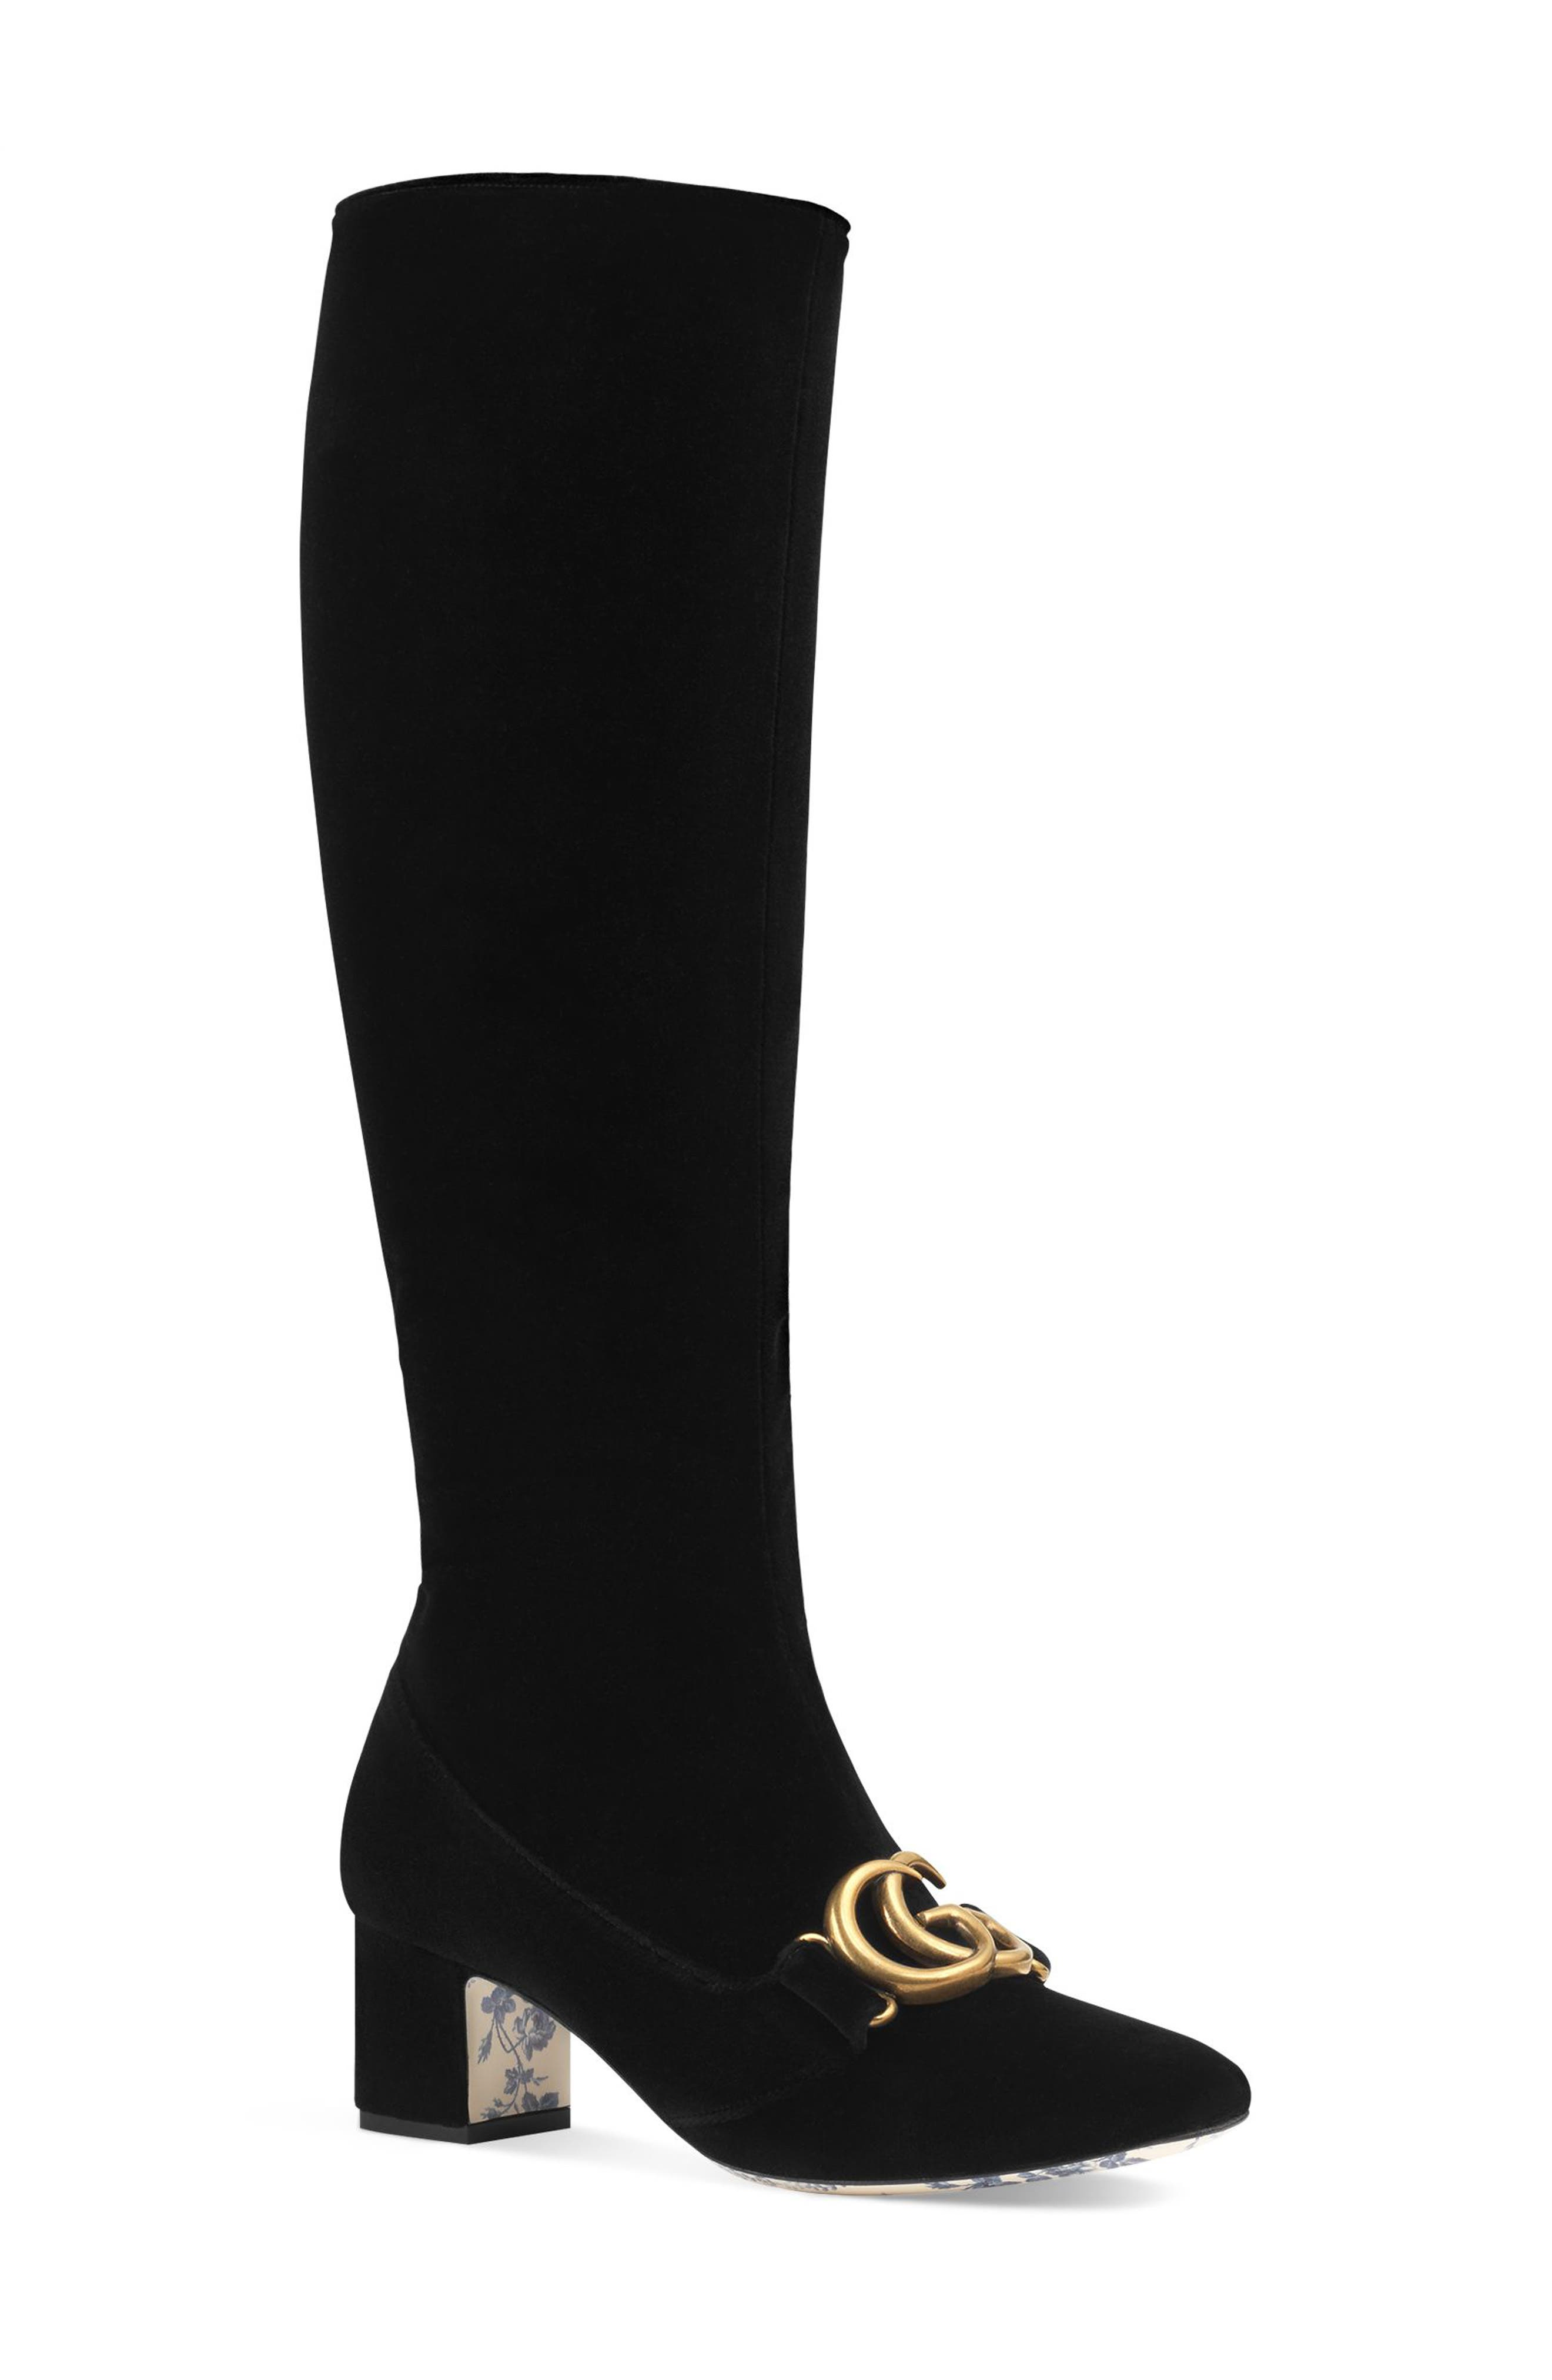 Gucci Victoire Marmont Boot, Black